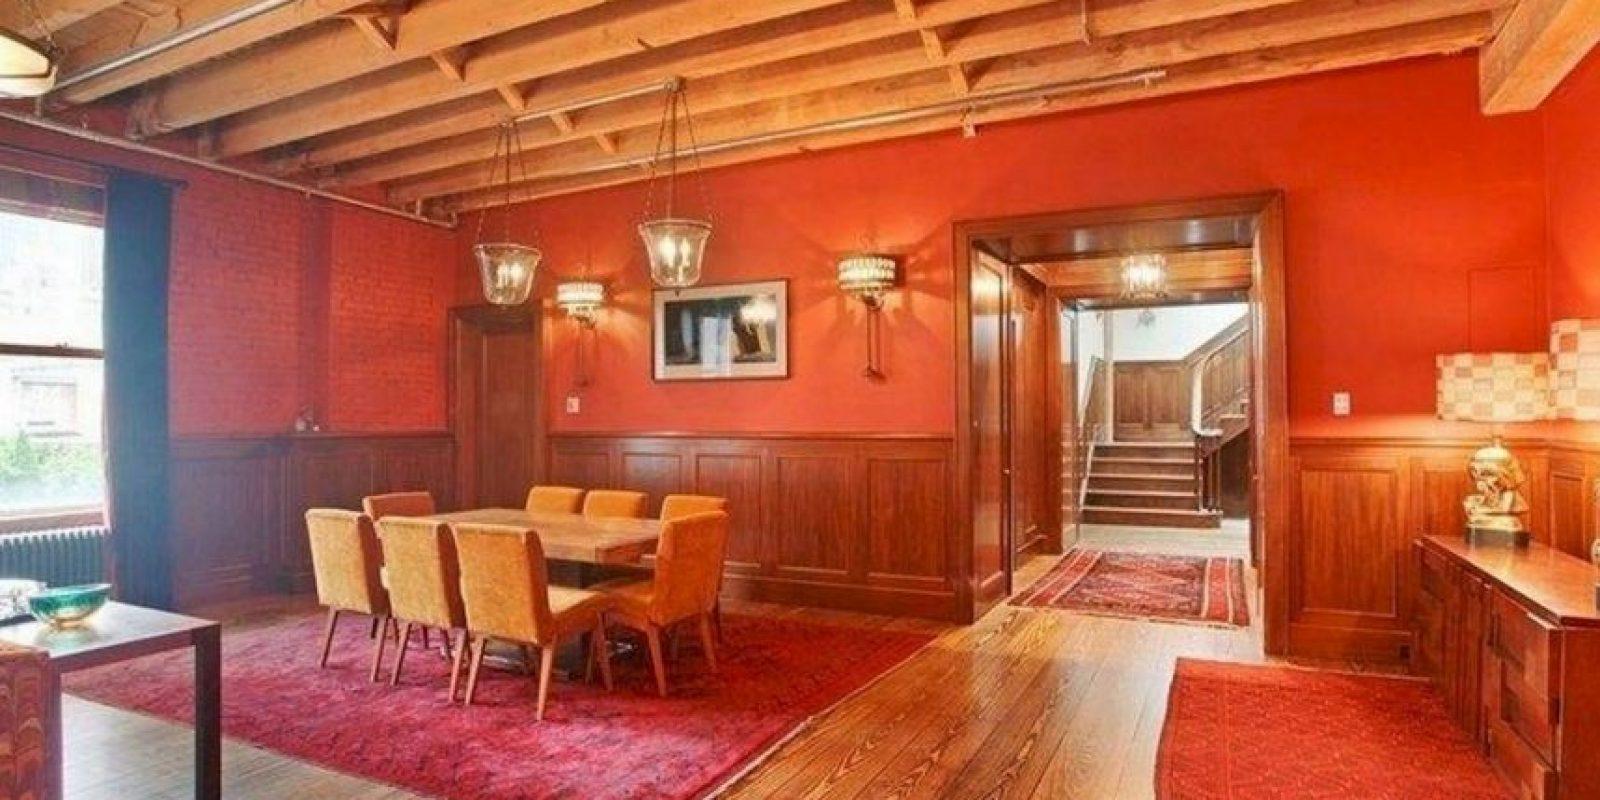 Majestuoso salón decorado con madera Foto:Vía Street Easy